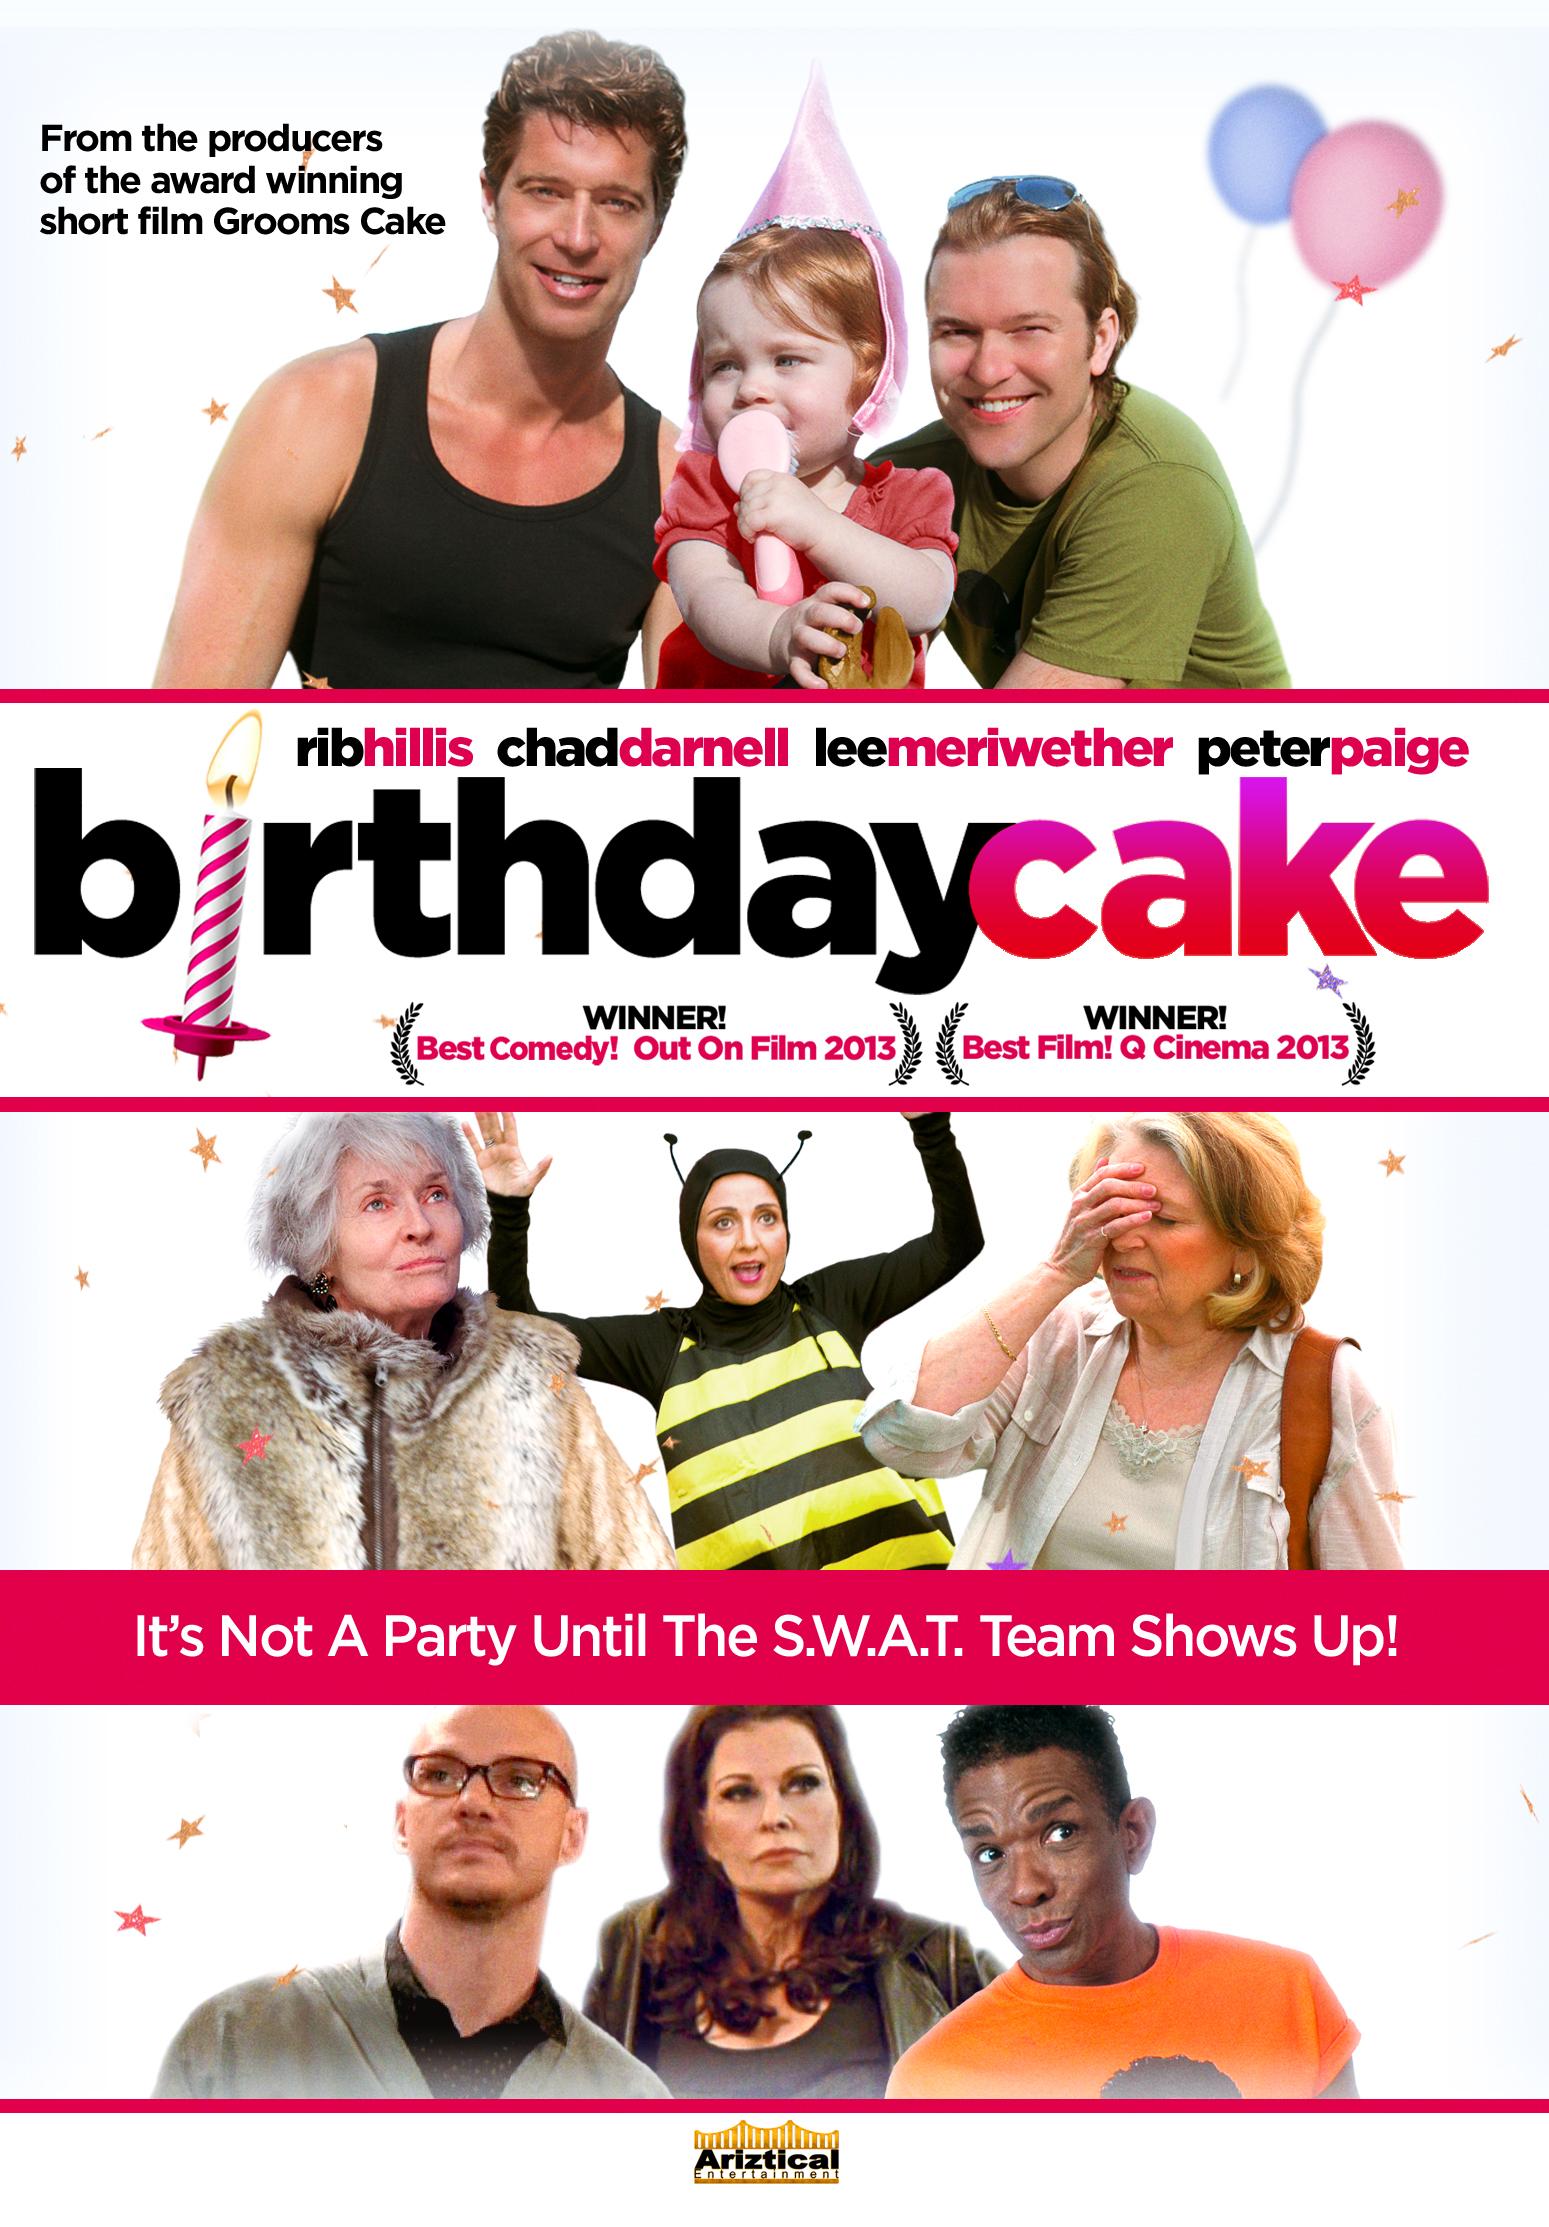 Pleasant Birthday Cake 2013 Imdb Funny Birthday Cards Online Alyptdamsfinfo